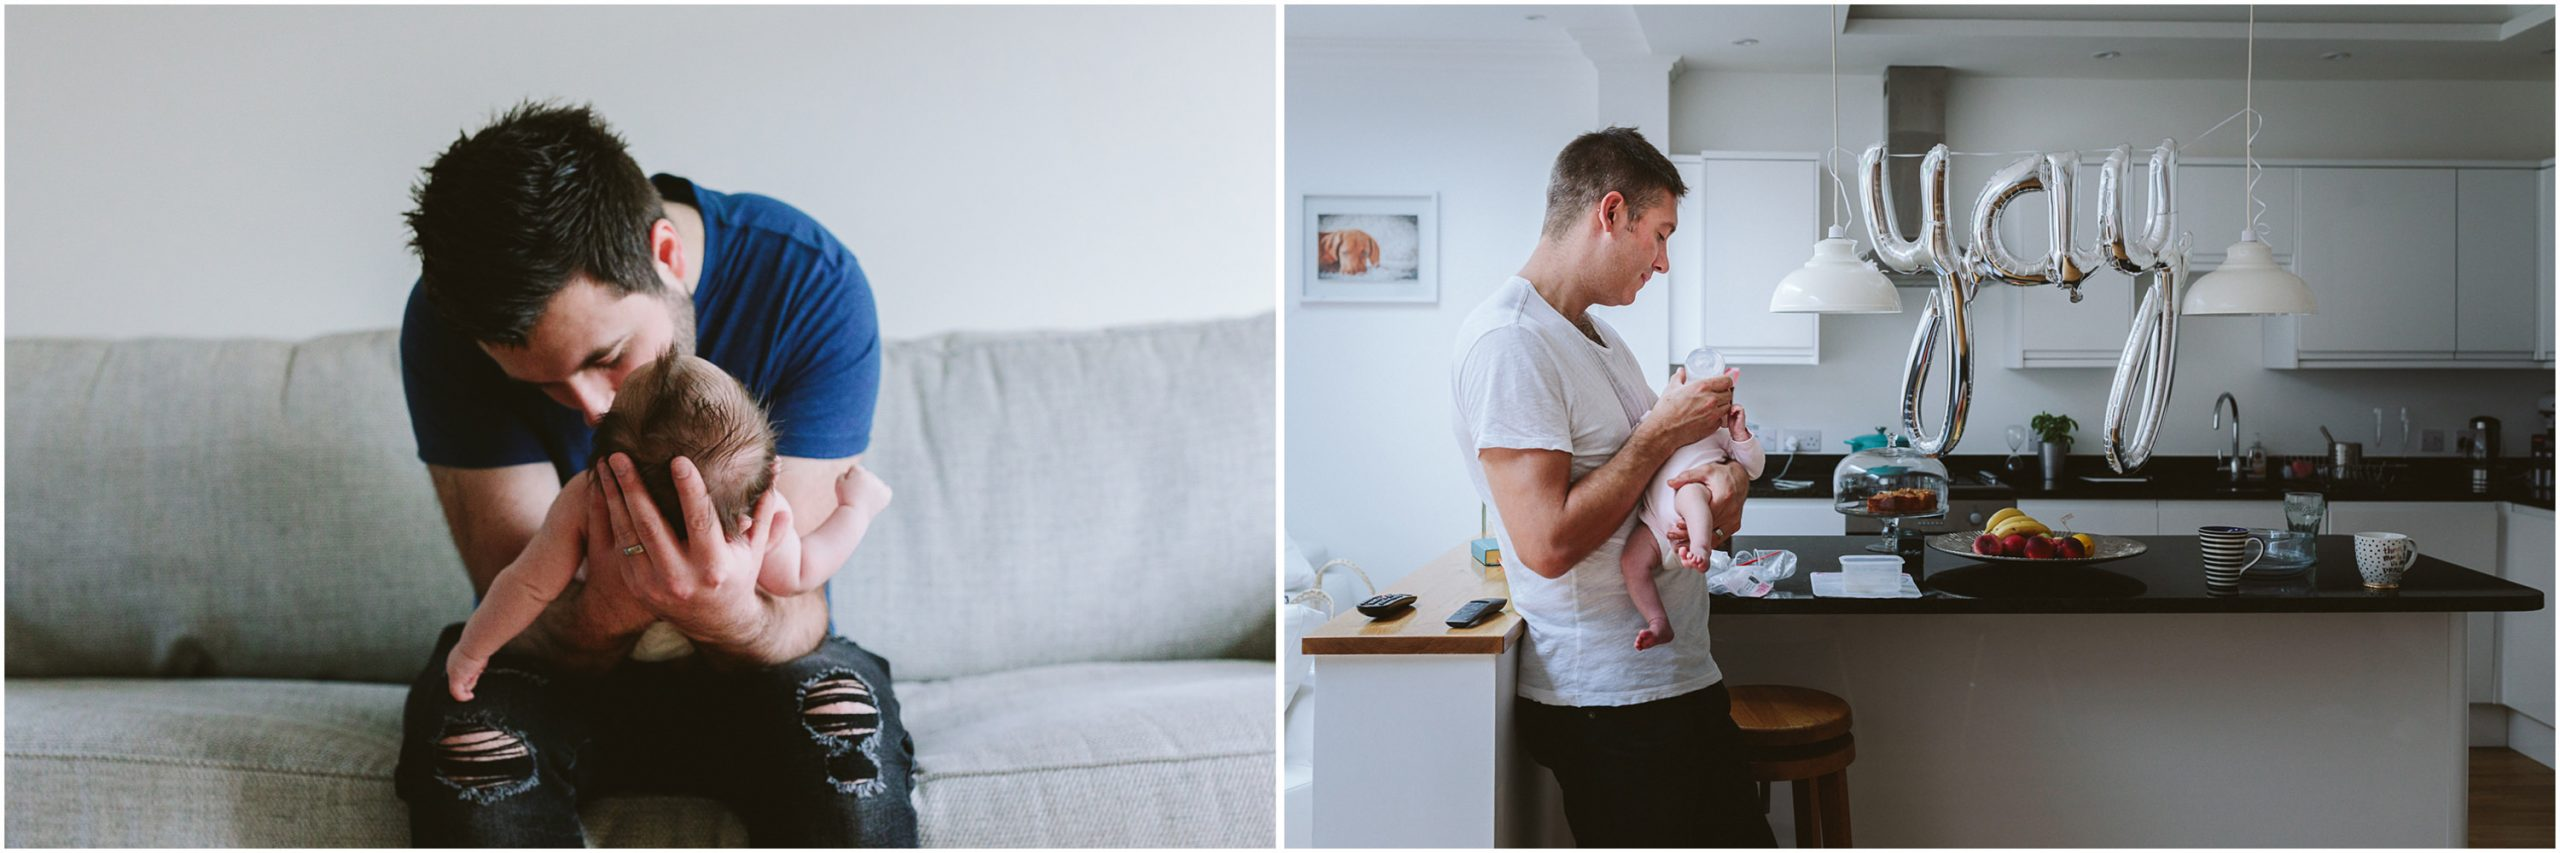 Dads with Newborns